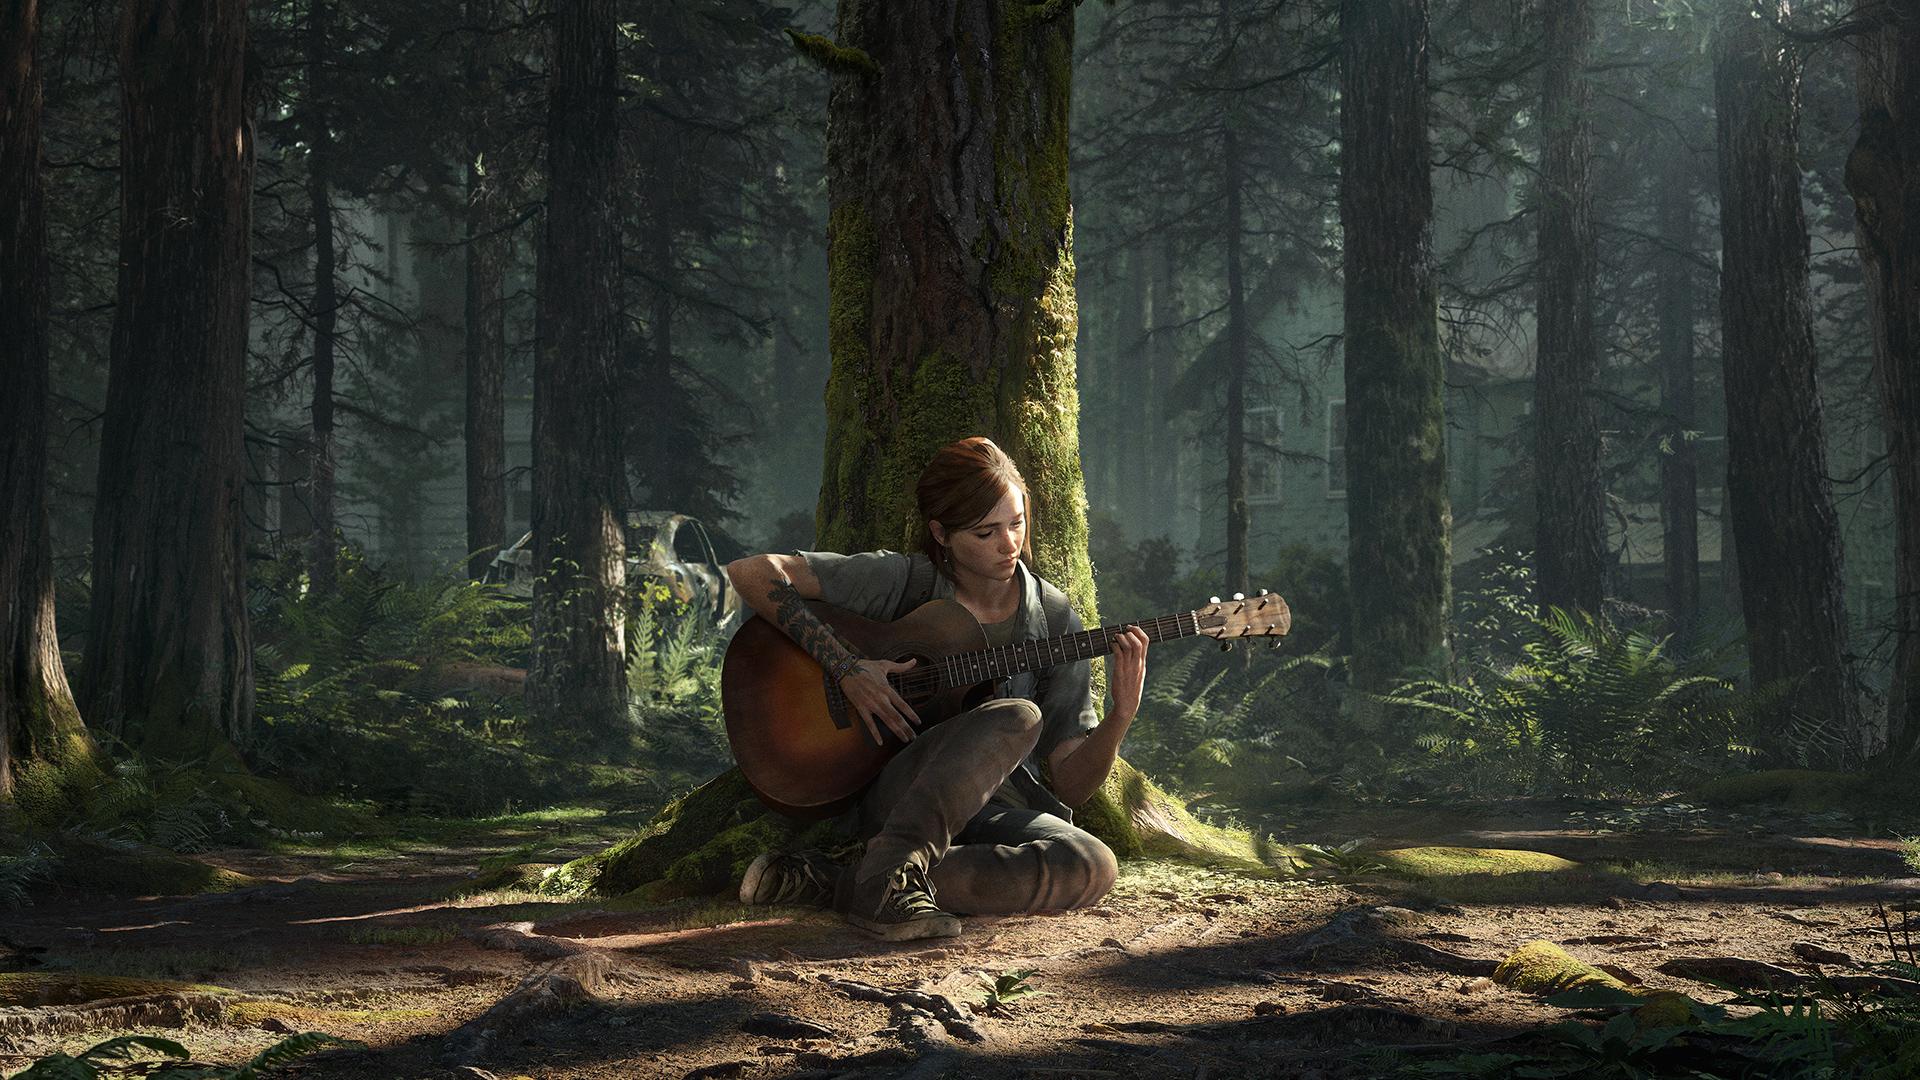 2560x1080 Ellie The Last of Us 2 2560x1080 Resolution Wallpaper 1920x1080